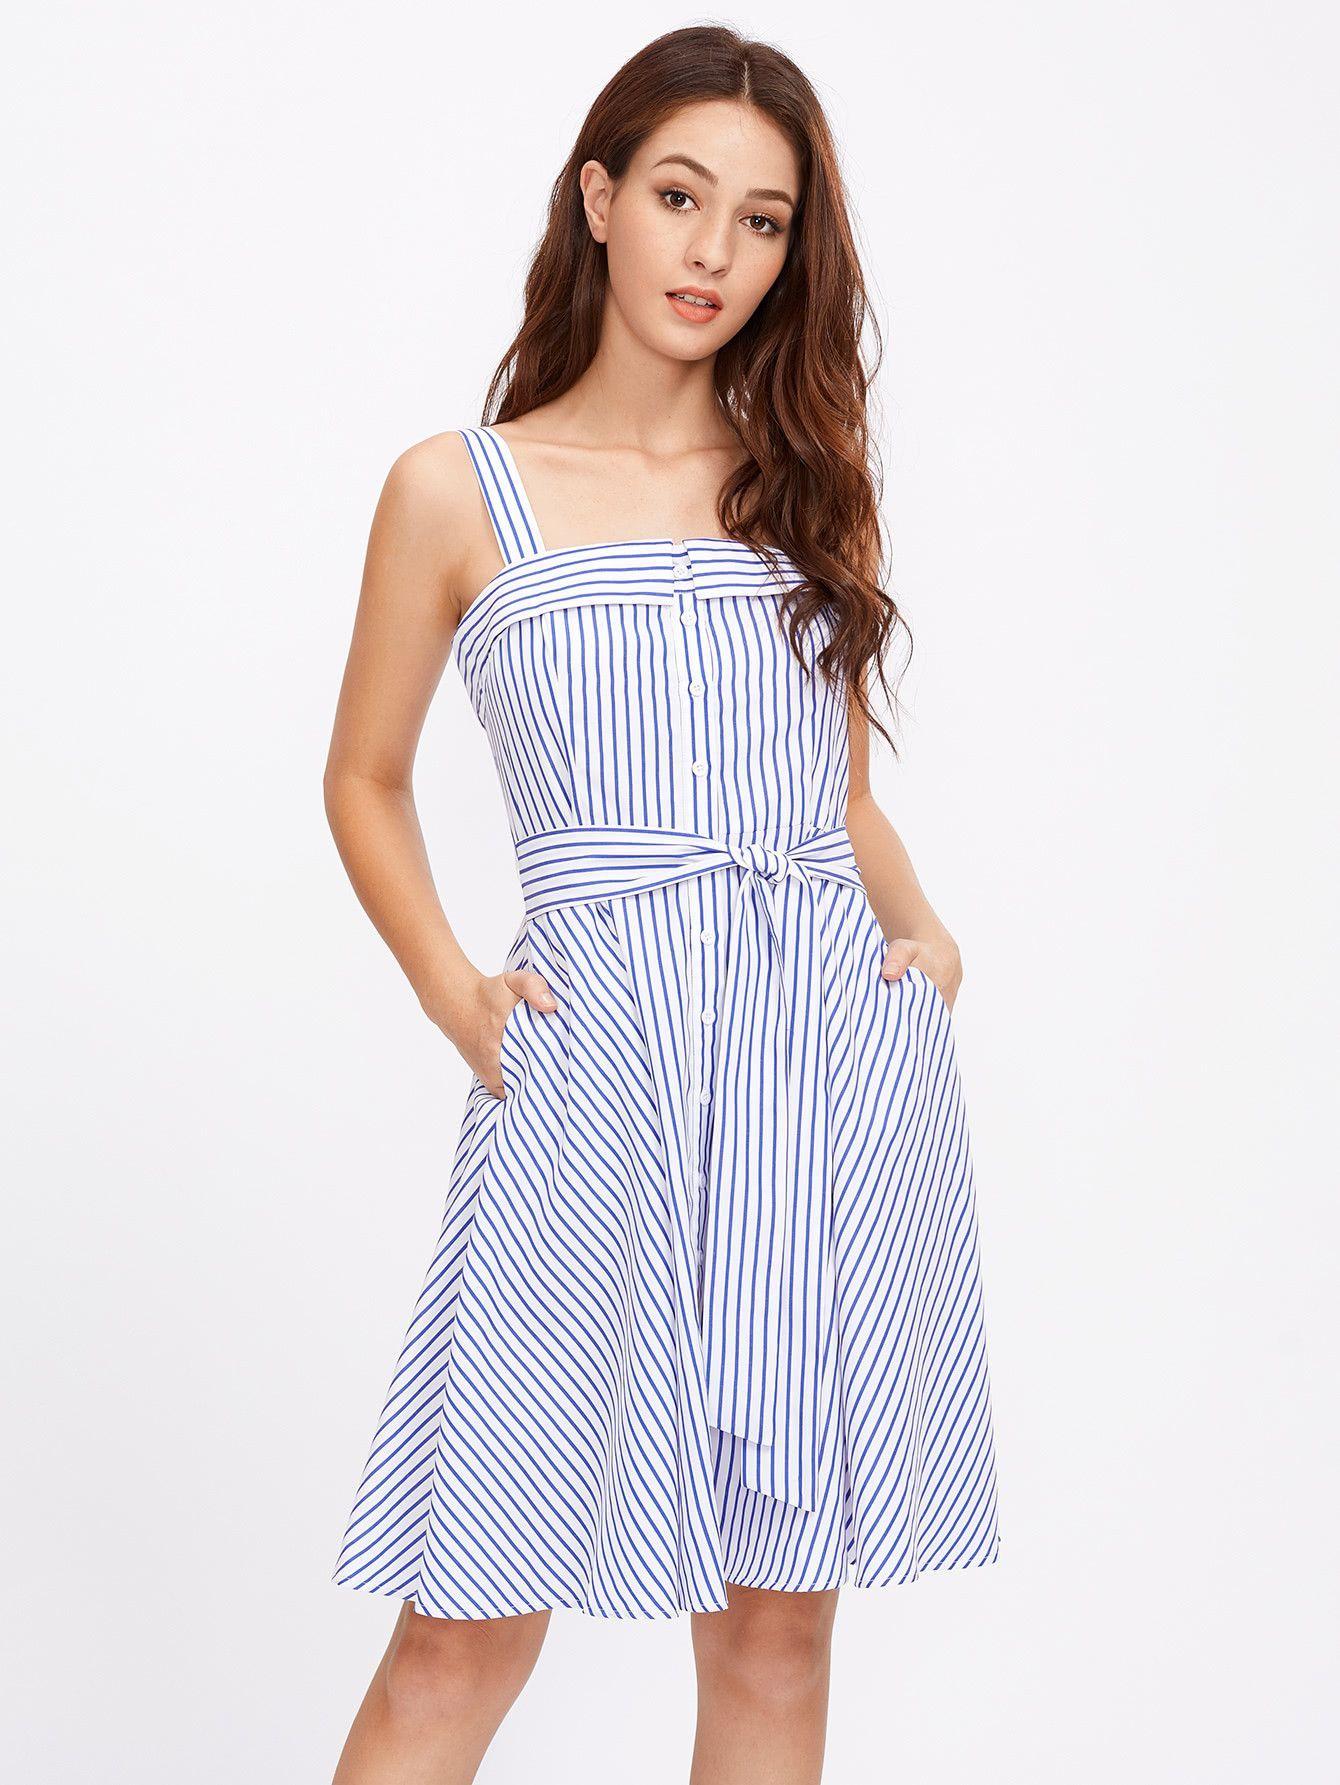 24443c52ece Material  100% Polyester Color  Blue Pattern Type  Striped Neckline   Spaghetti Strap